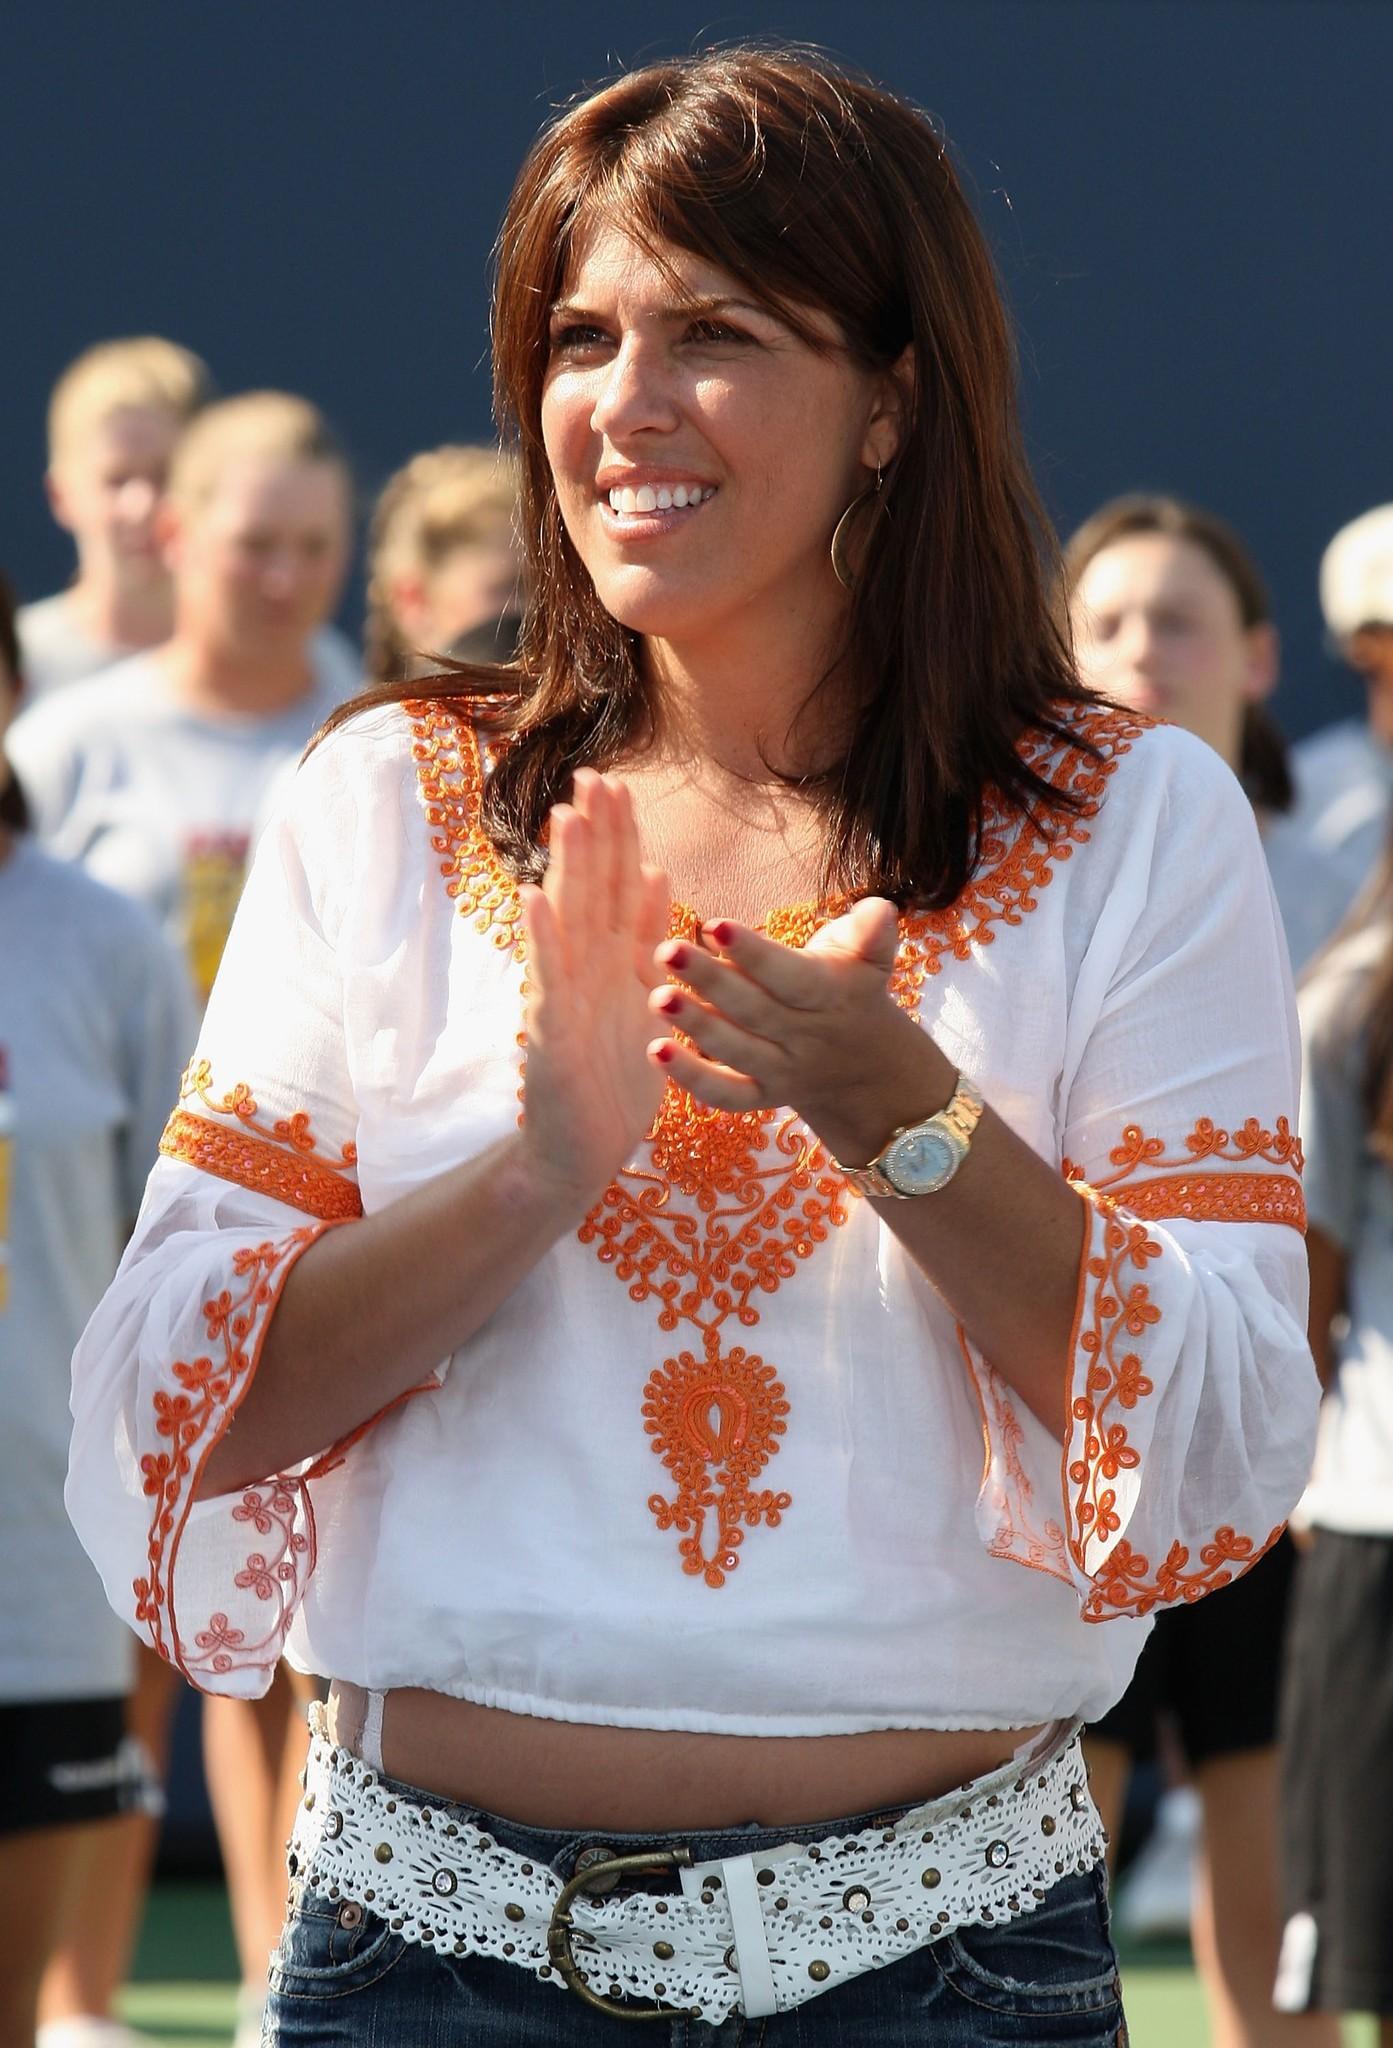 Jennifer Capriati Public Speaking & Appearances Speakerpedia